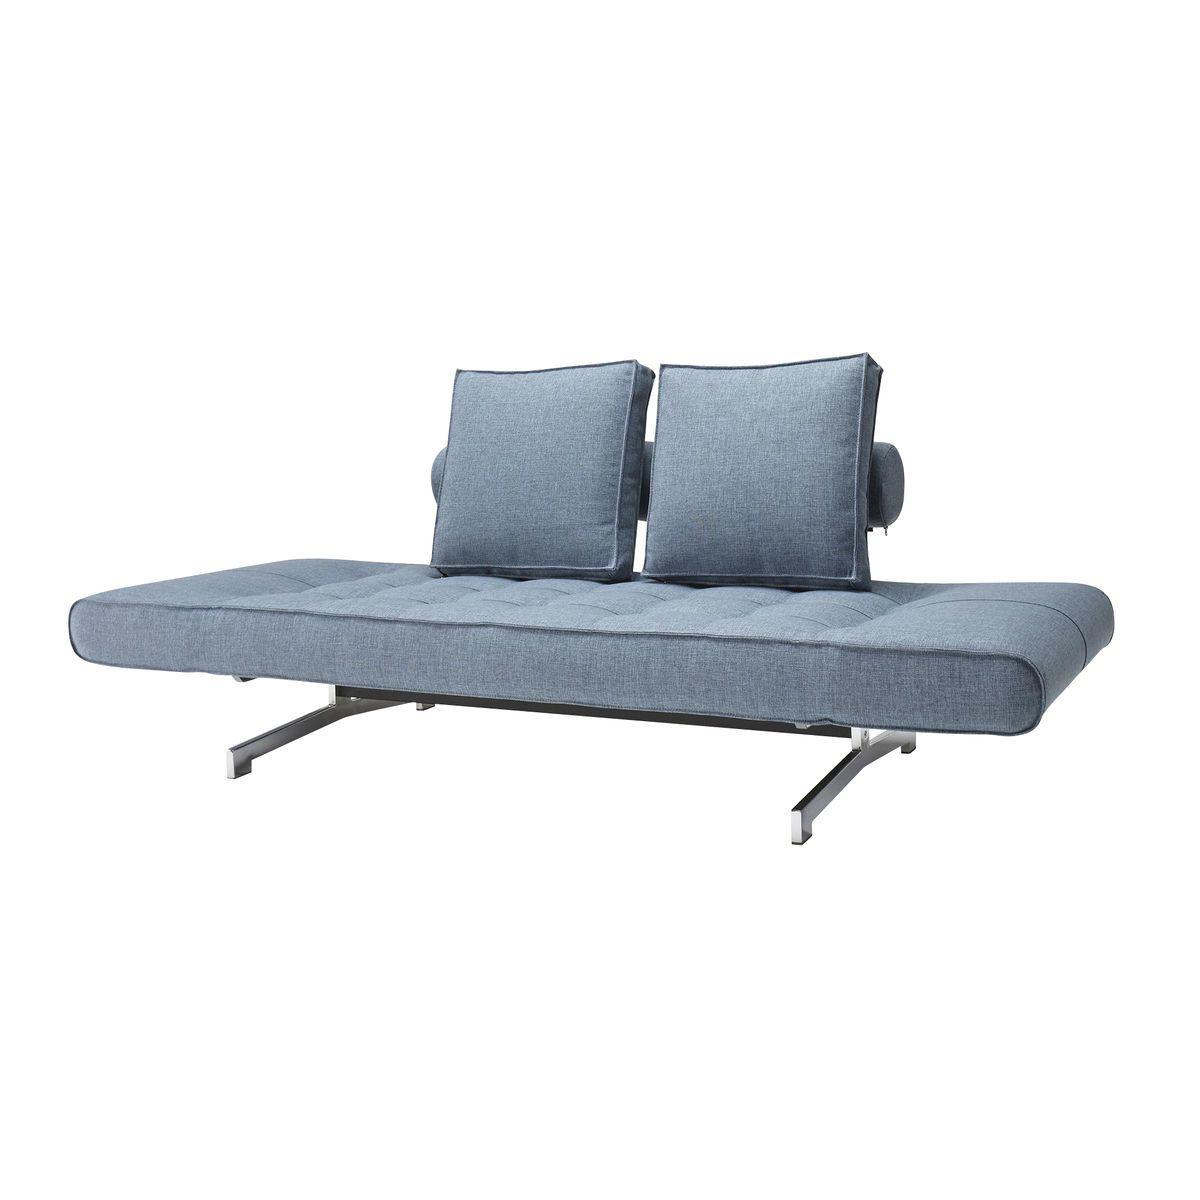 Ghia Sofa Bed Innovation